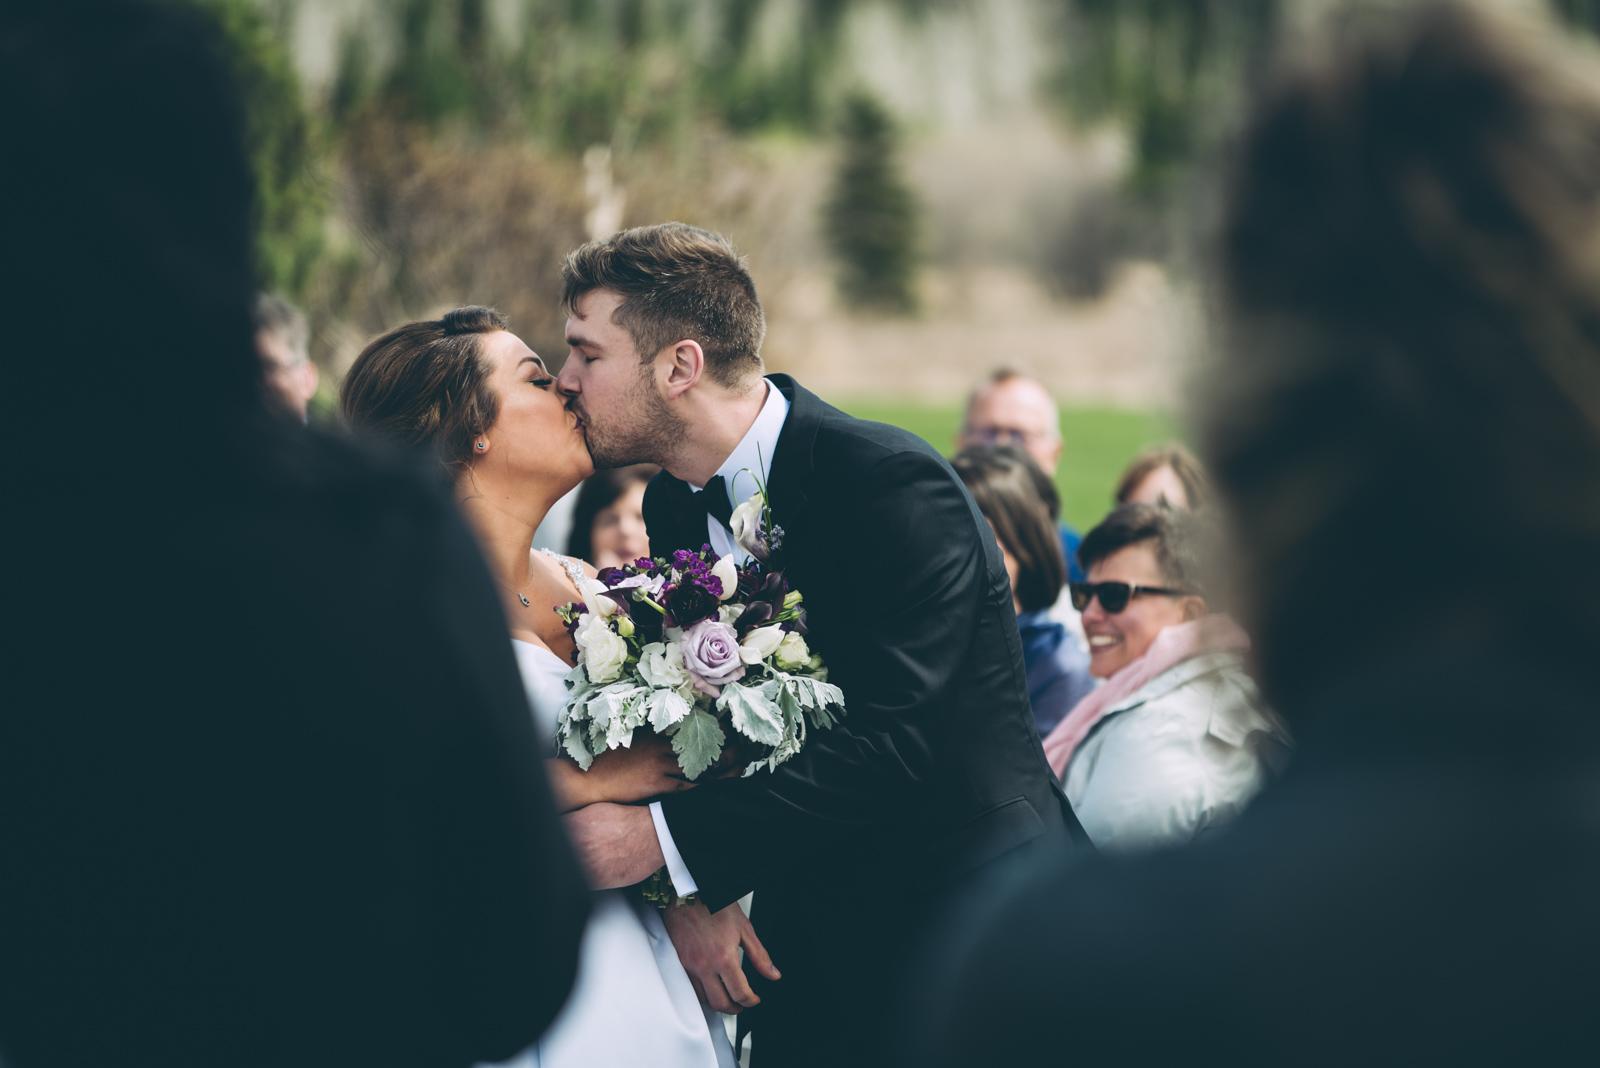 top-wedding-photos-2018-blog-5.jpg